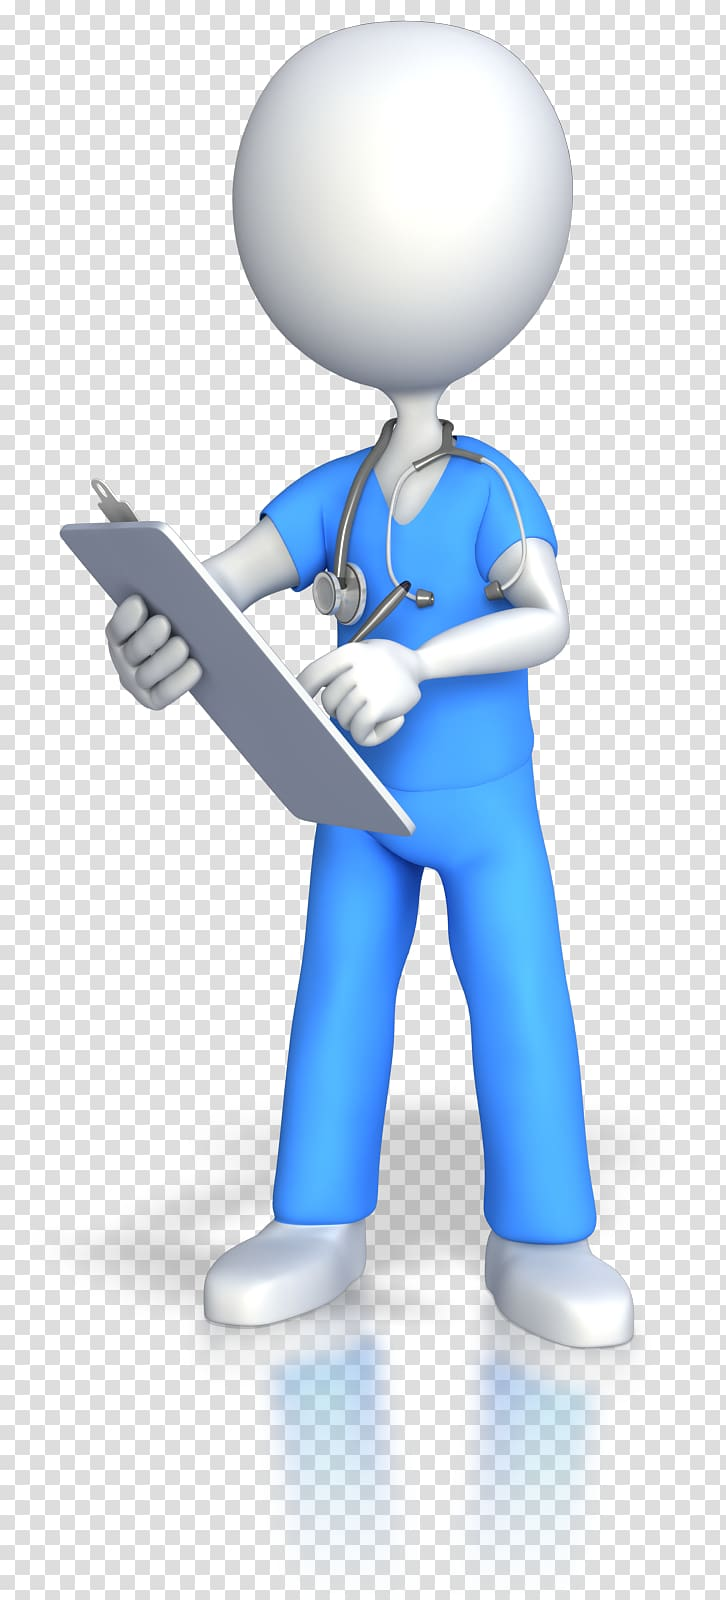 Doctor animated character, Nursing Registered nurse Stick.